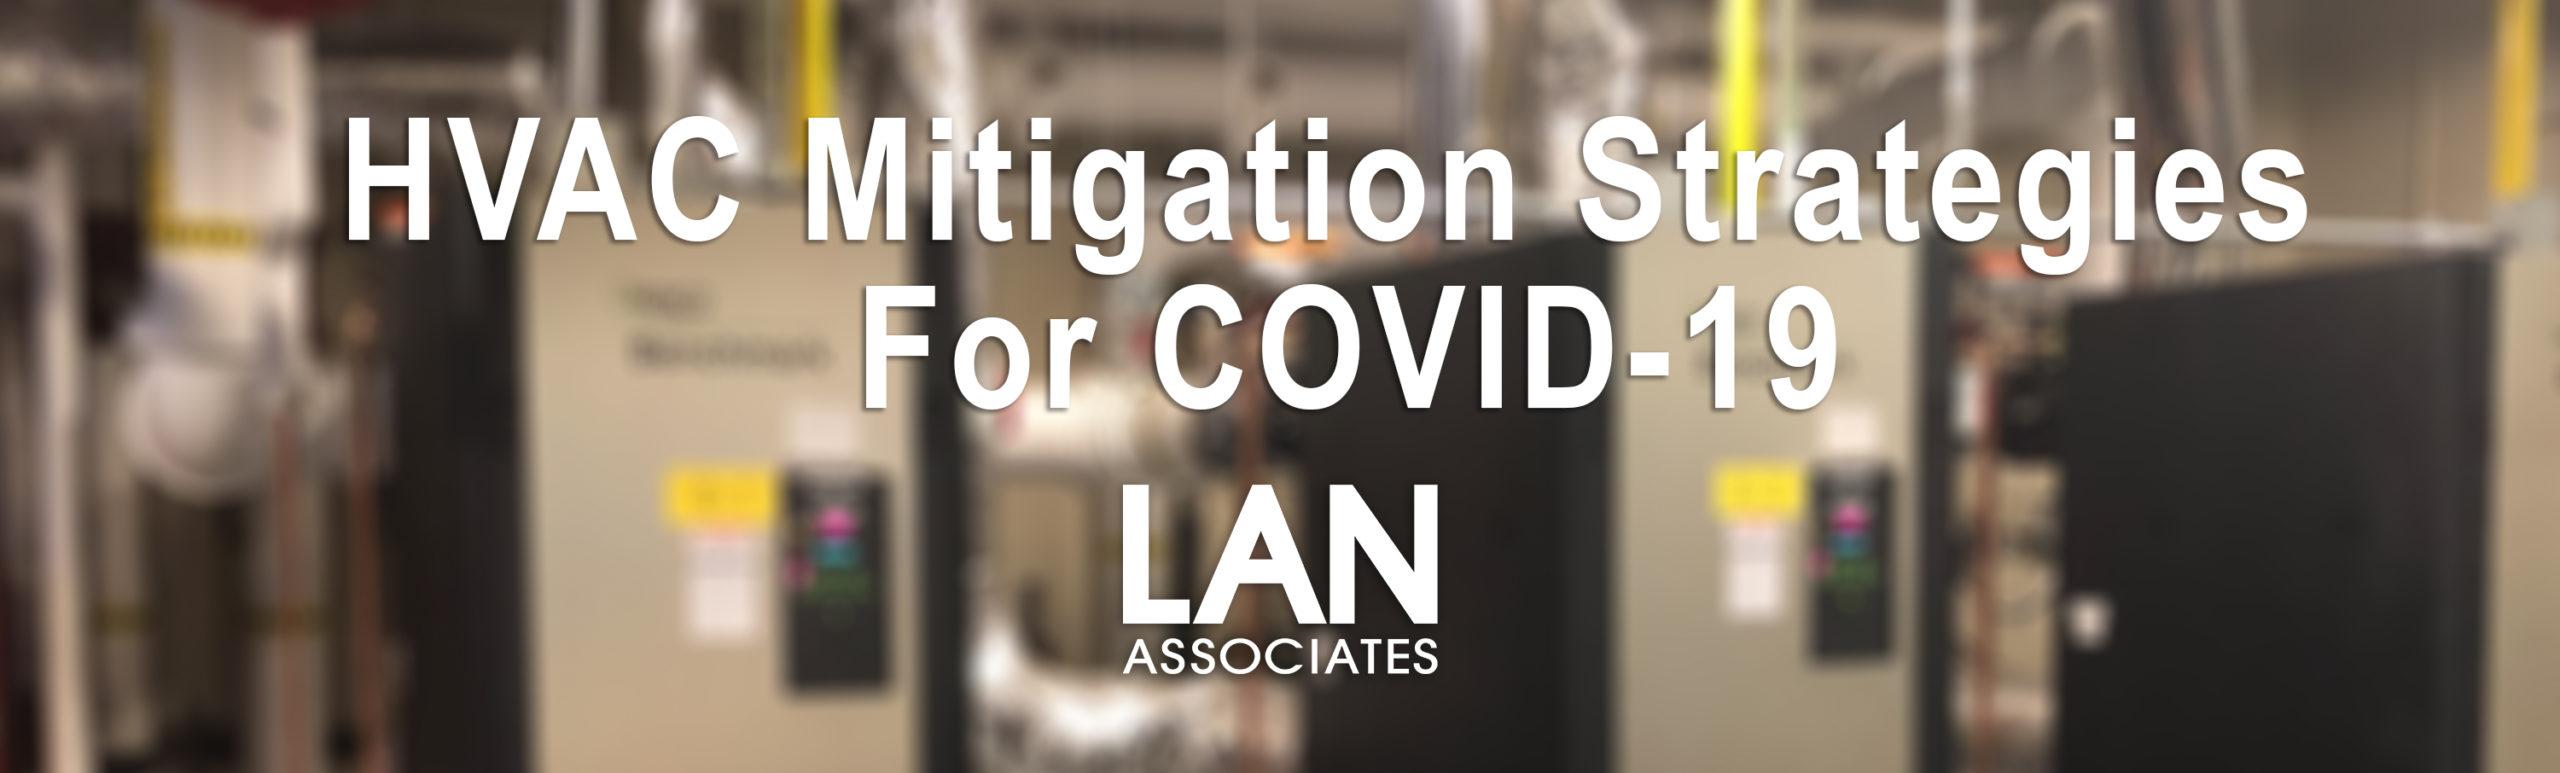 HVAC and Covid-19